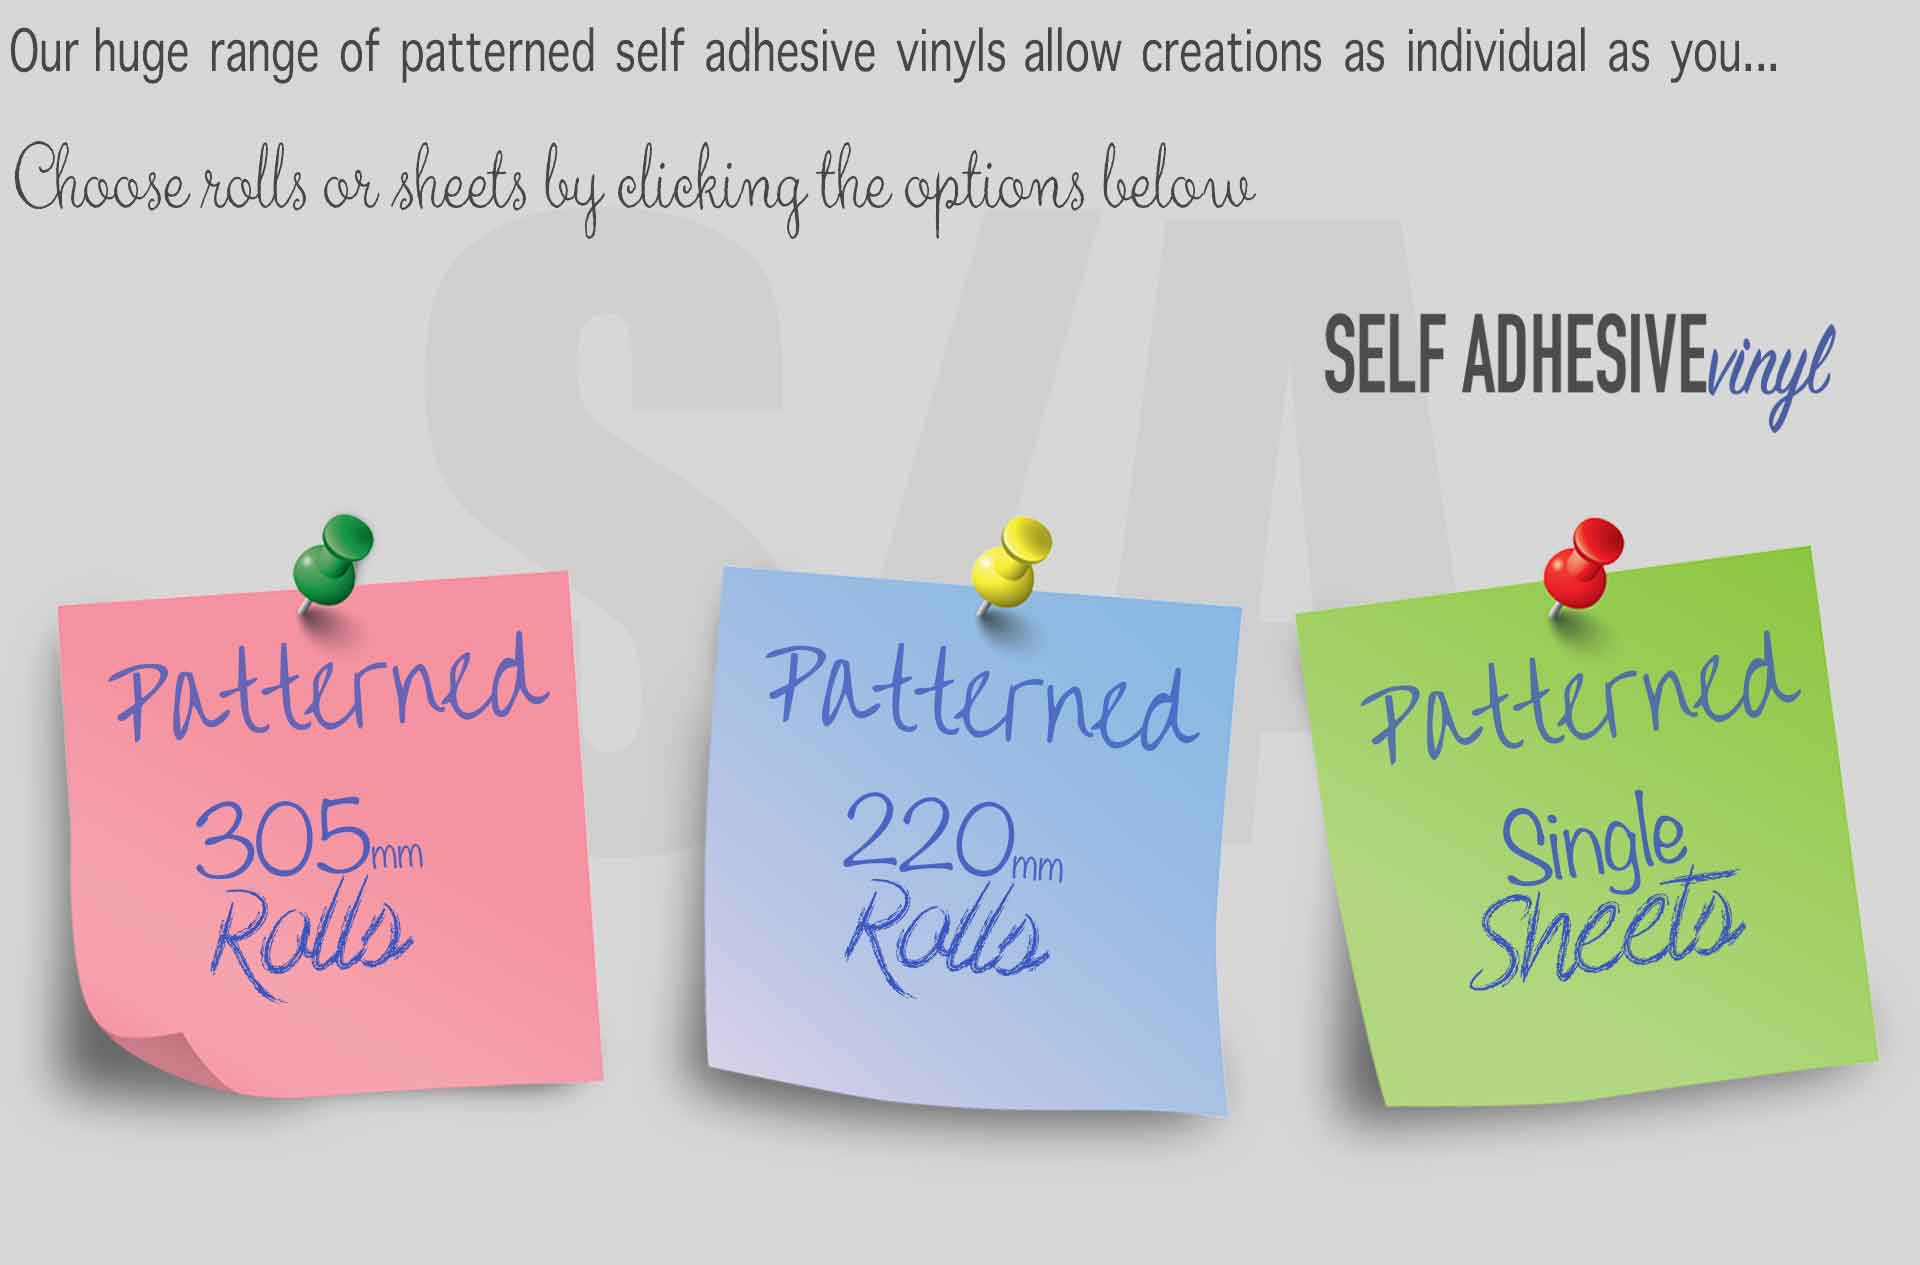 Desktop-SA-Patterned-Vinyl-Landing-Page